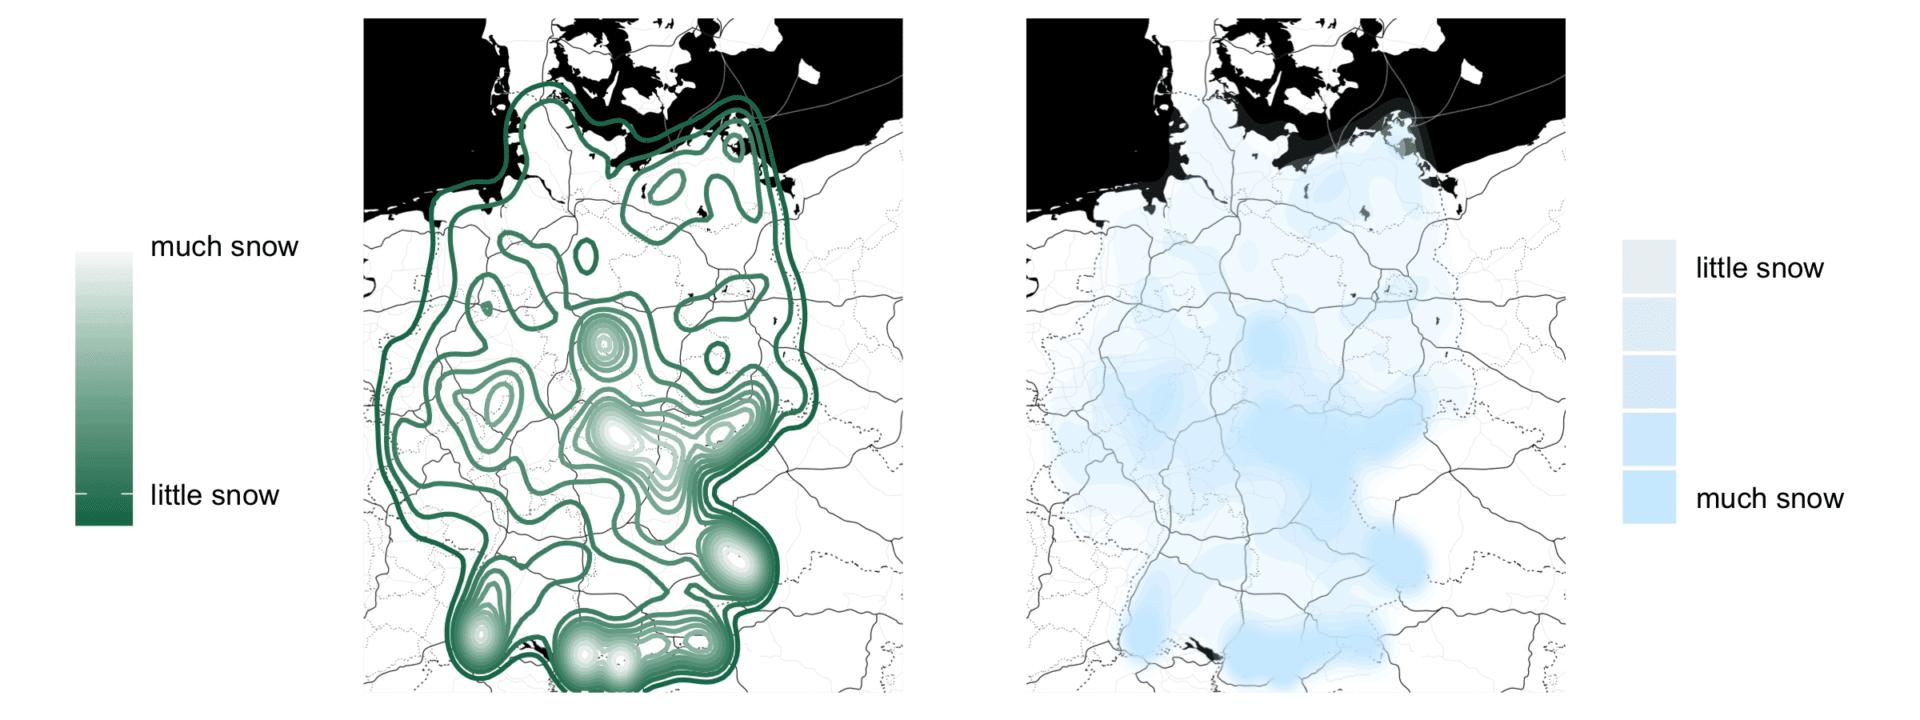 Average snow depth on Christmas Eve (2008-2017)